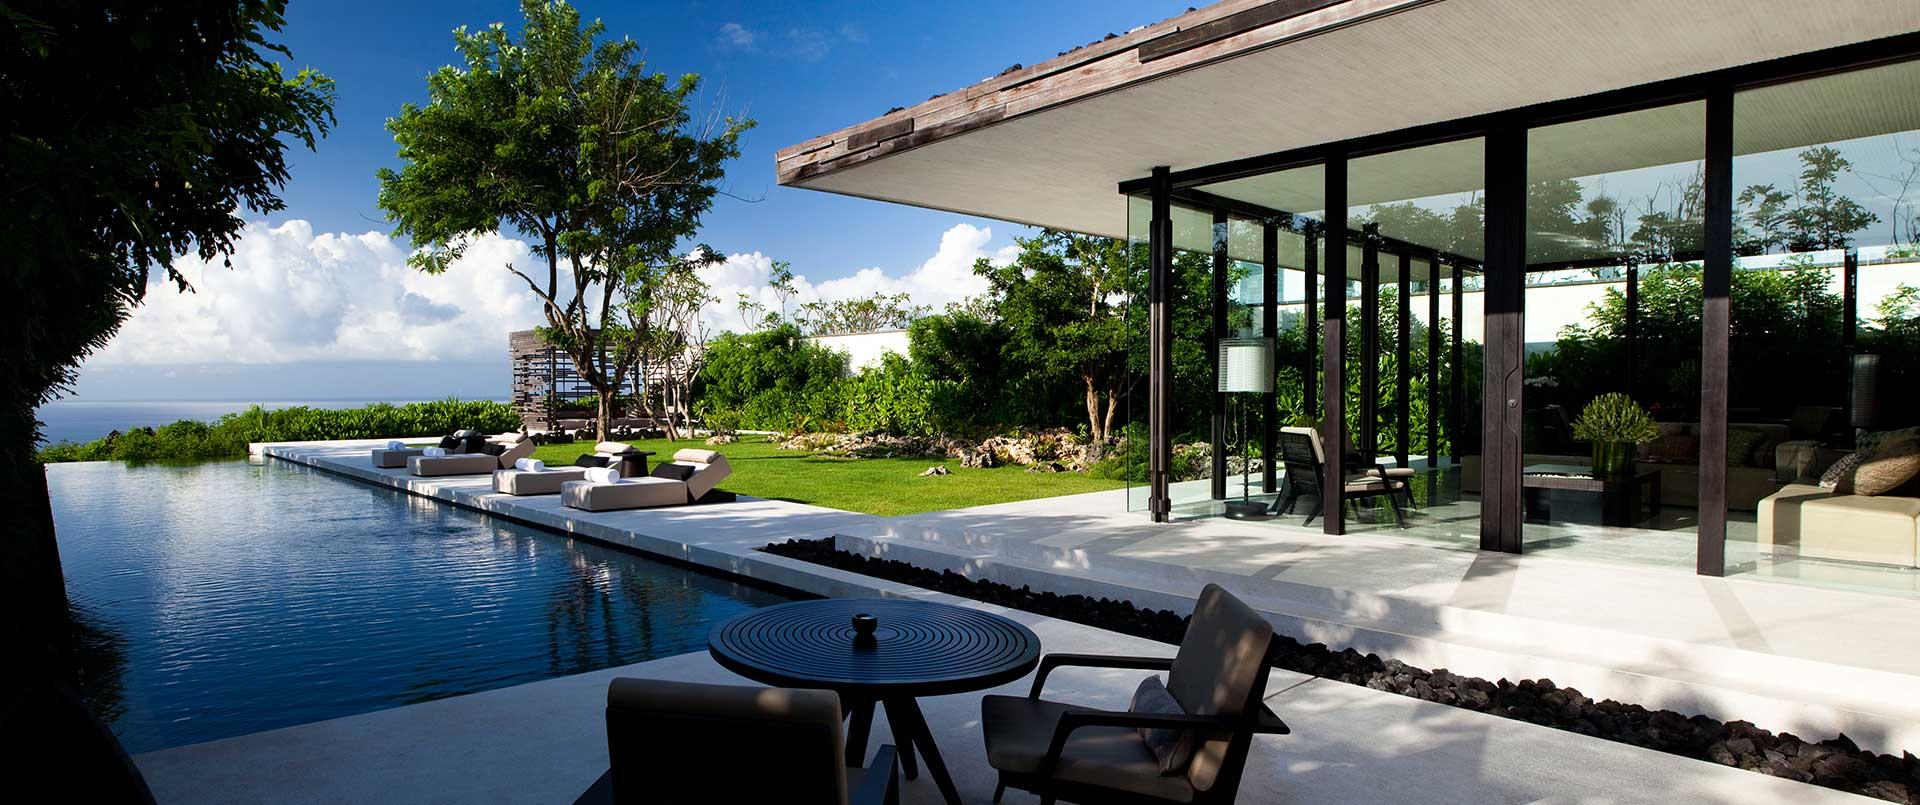 Alila Villas, Uluwatu, Bali